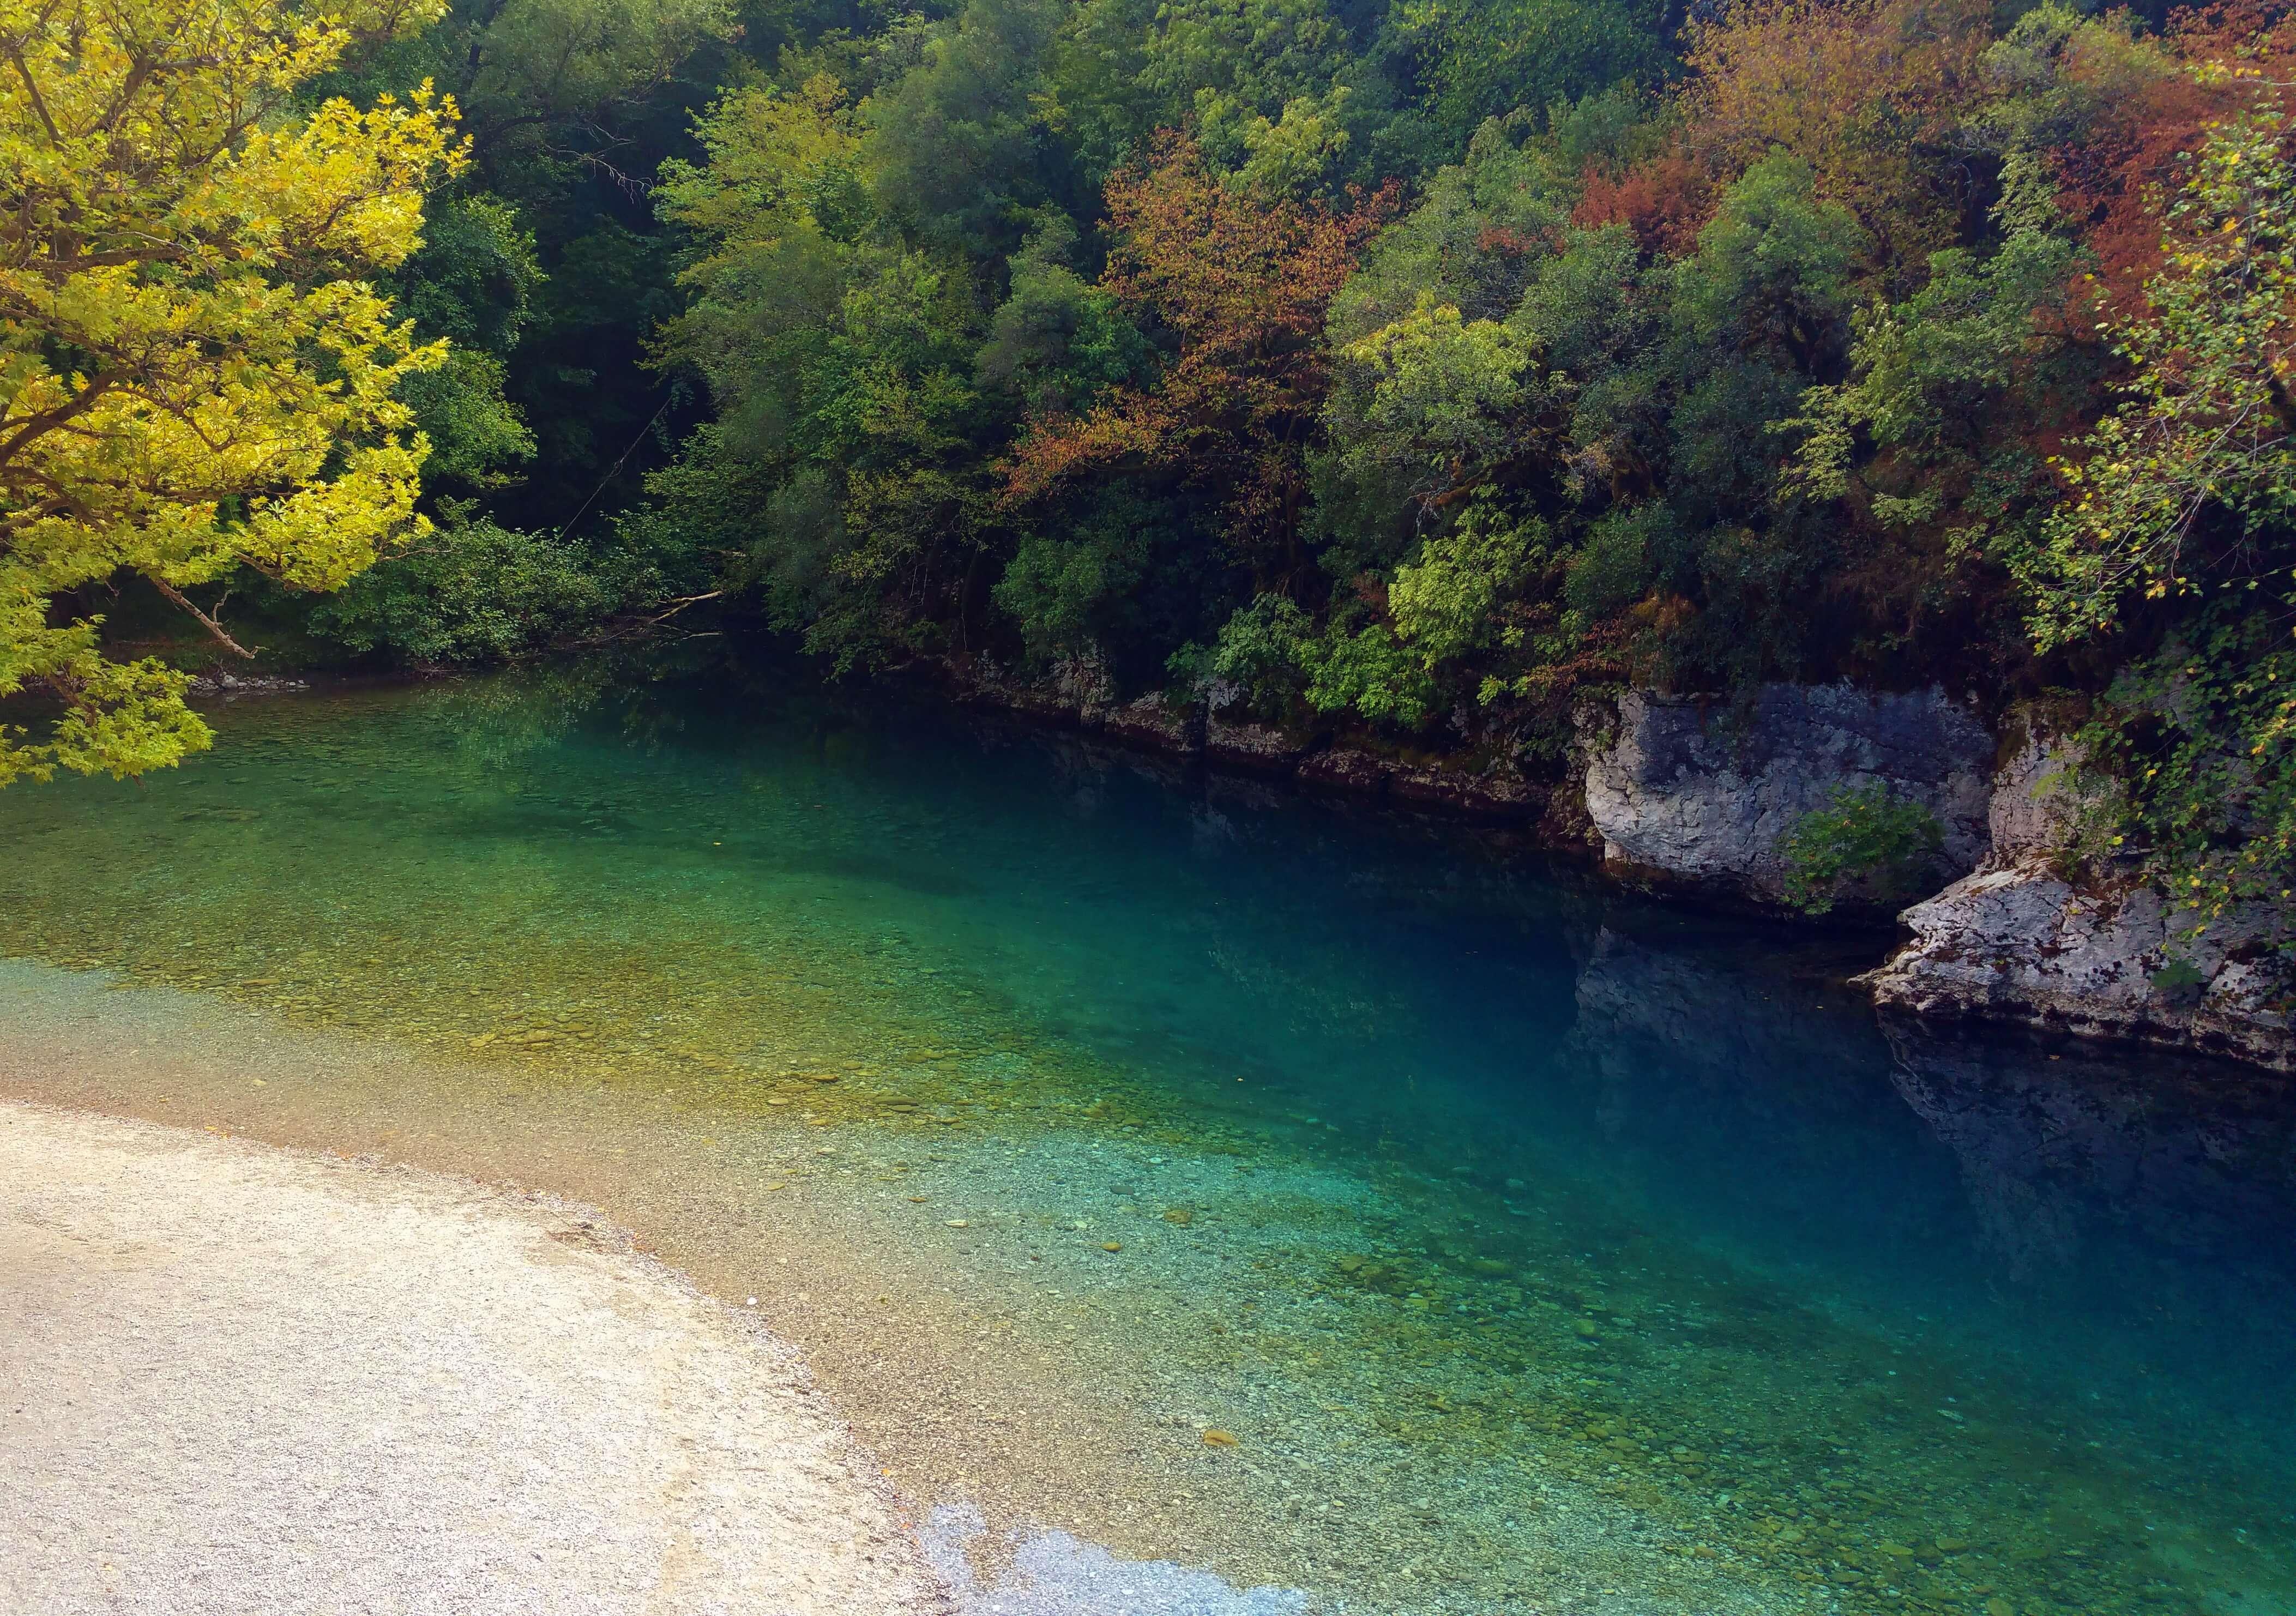 Voidomatis River | Kicking Back the Pebbles